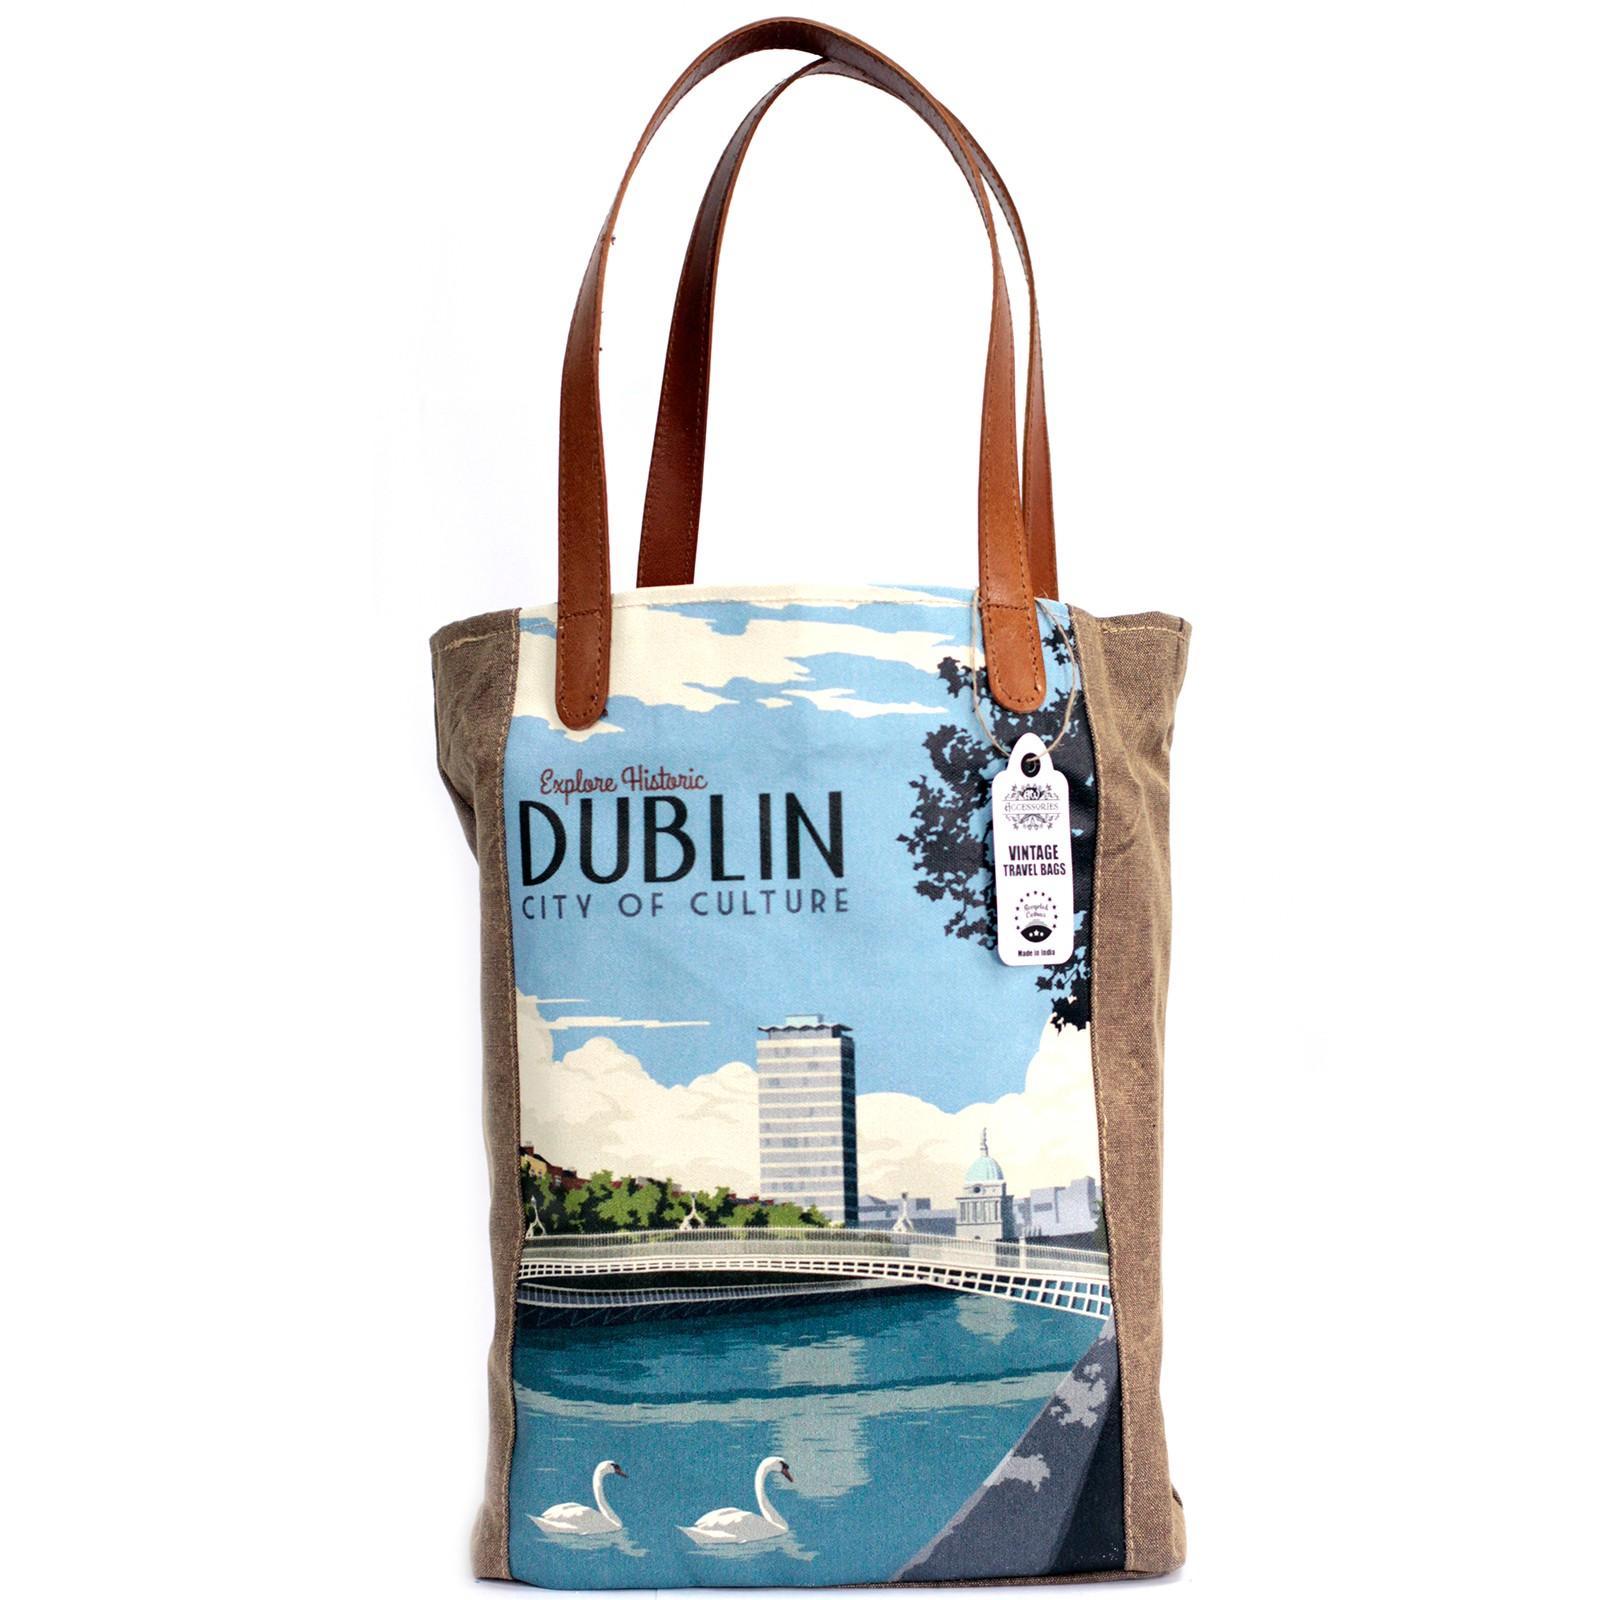 Vintage Travel Bag - Dublin